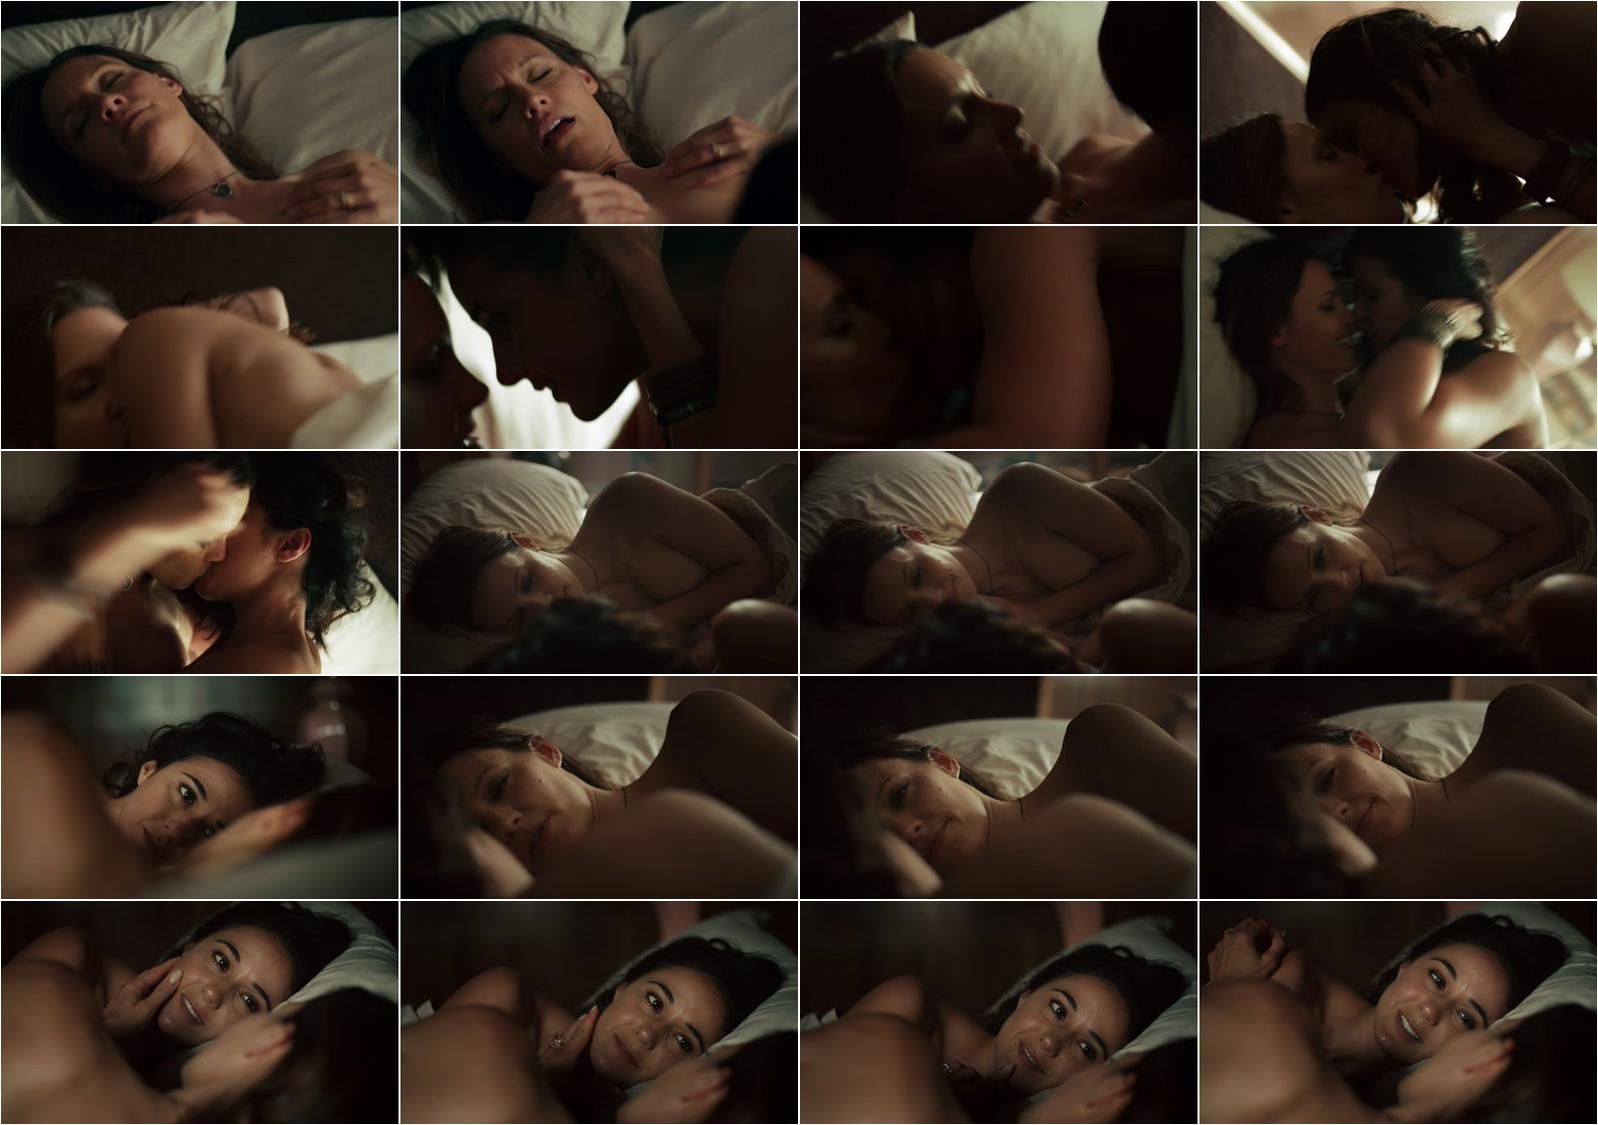 Emmanuelle Chriqui nude, KaDee Strickland nude - Shut Eye s01e01 (2016)